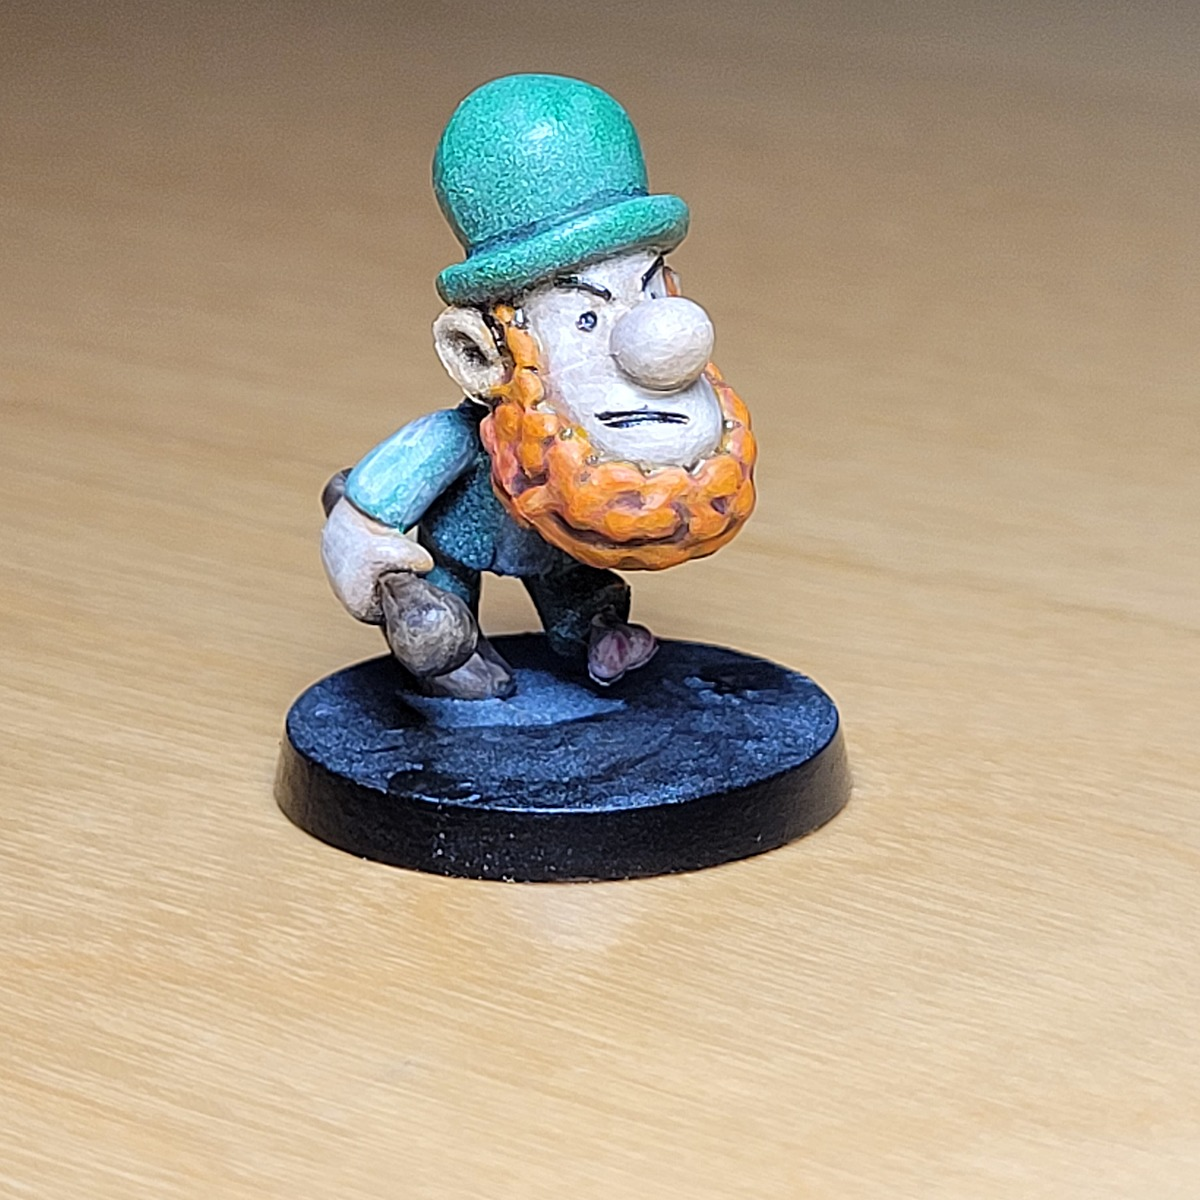 Leperchaun (Munchkin's Dungeon)